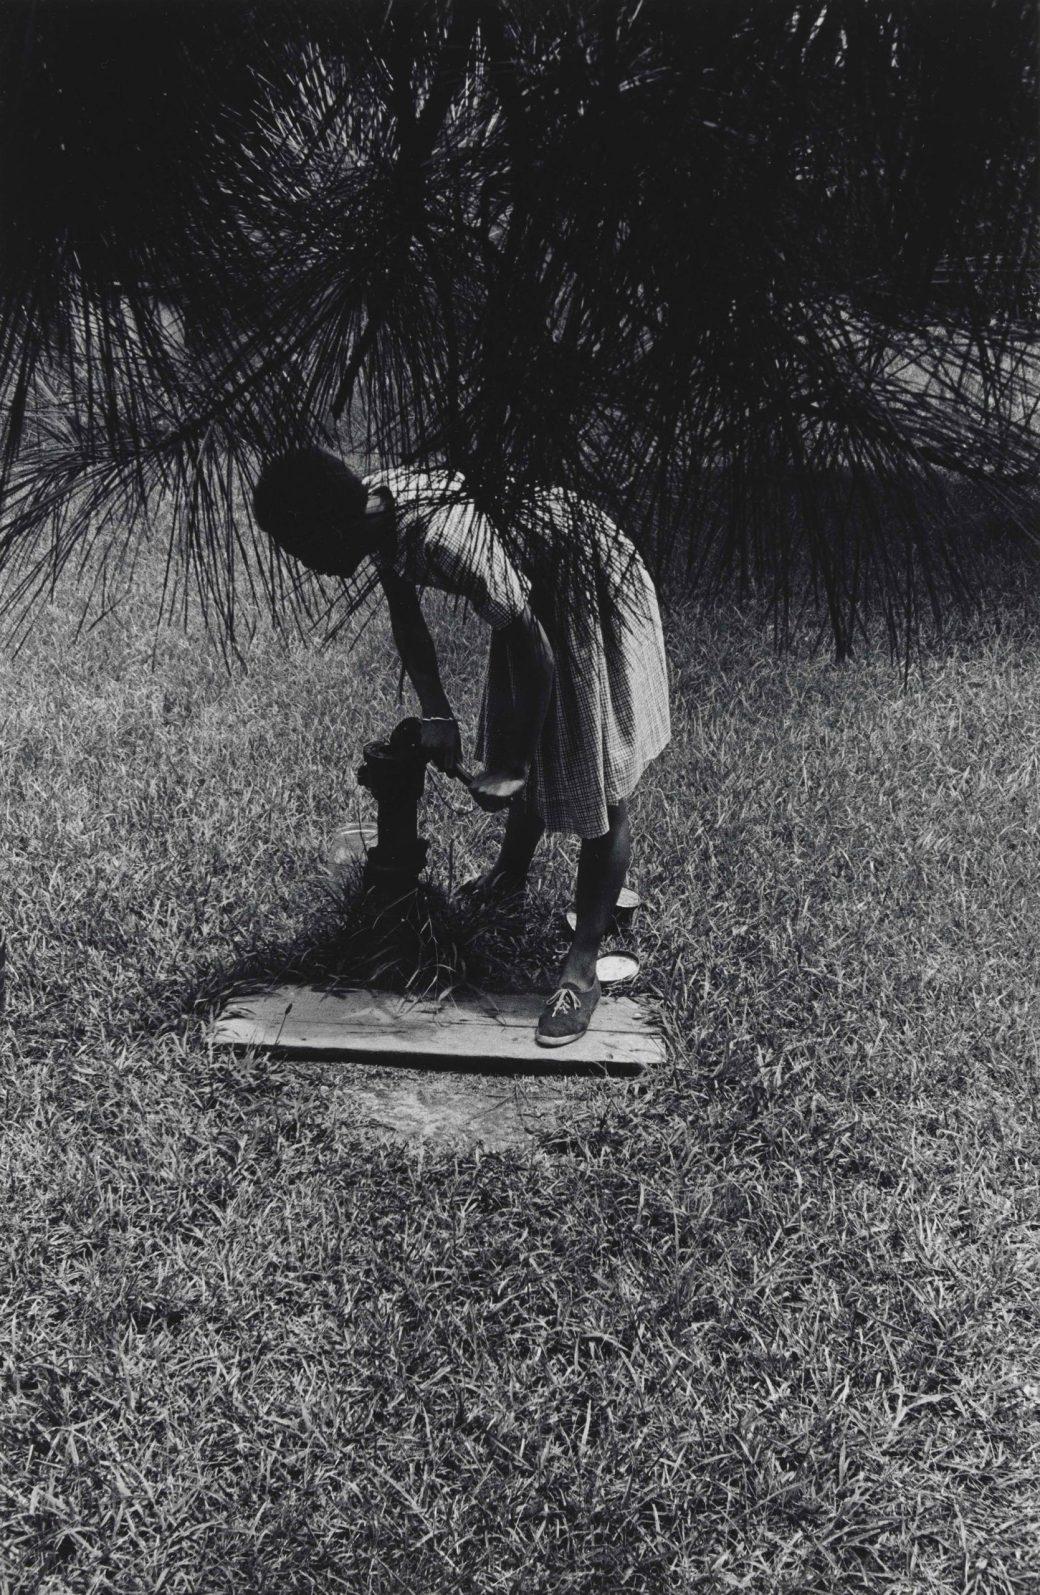 Herbert Randall, Untitled (Palmers Crossing, Mississippi), 1964